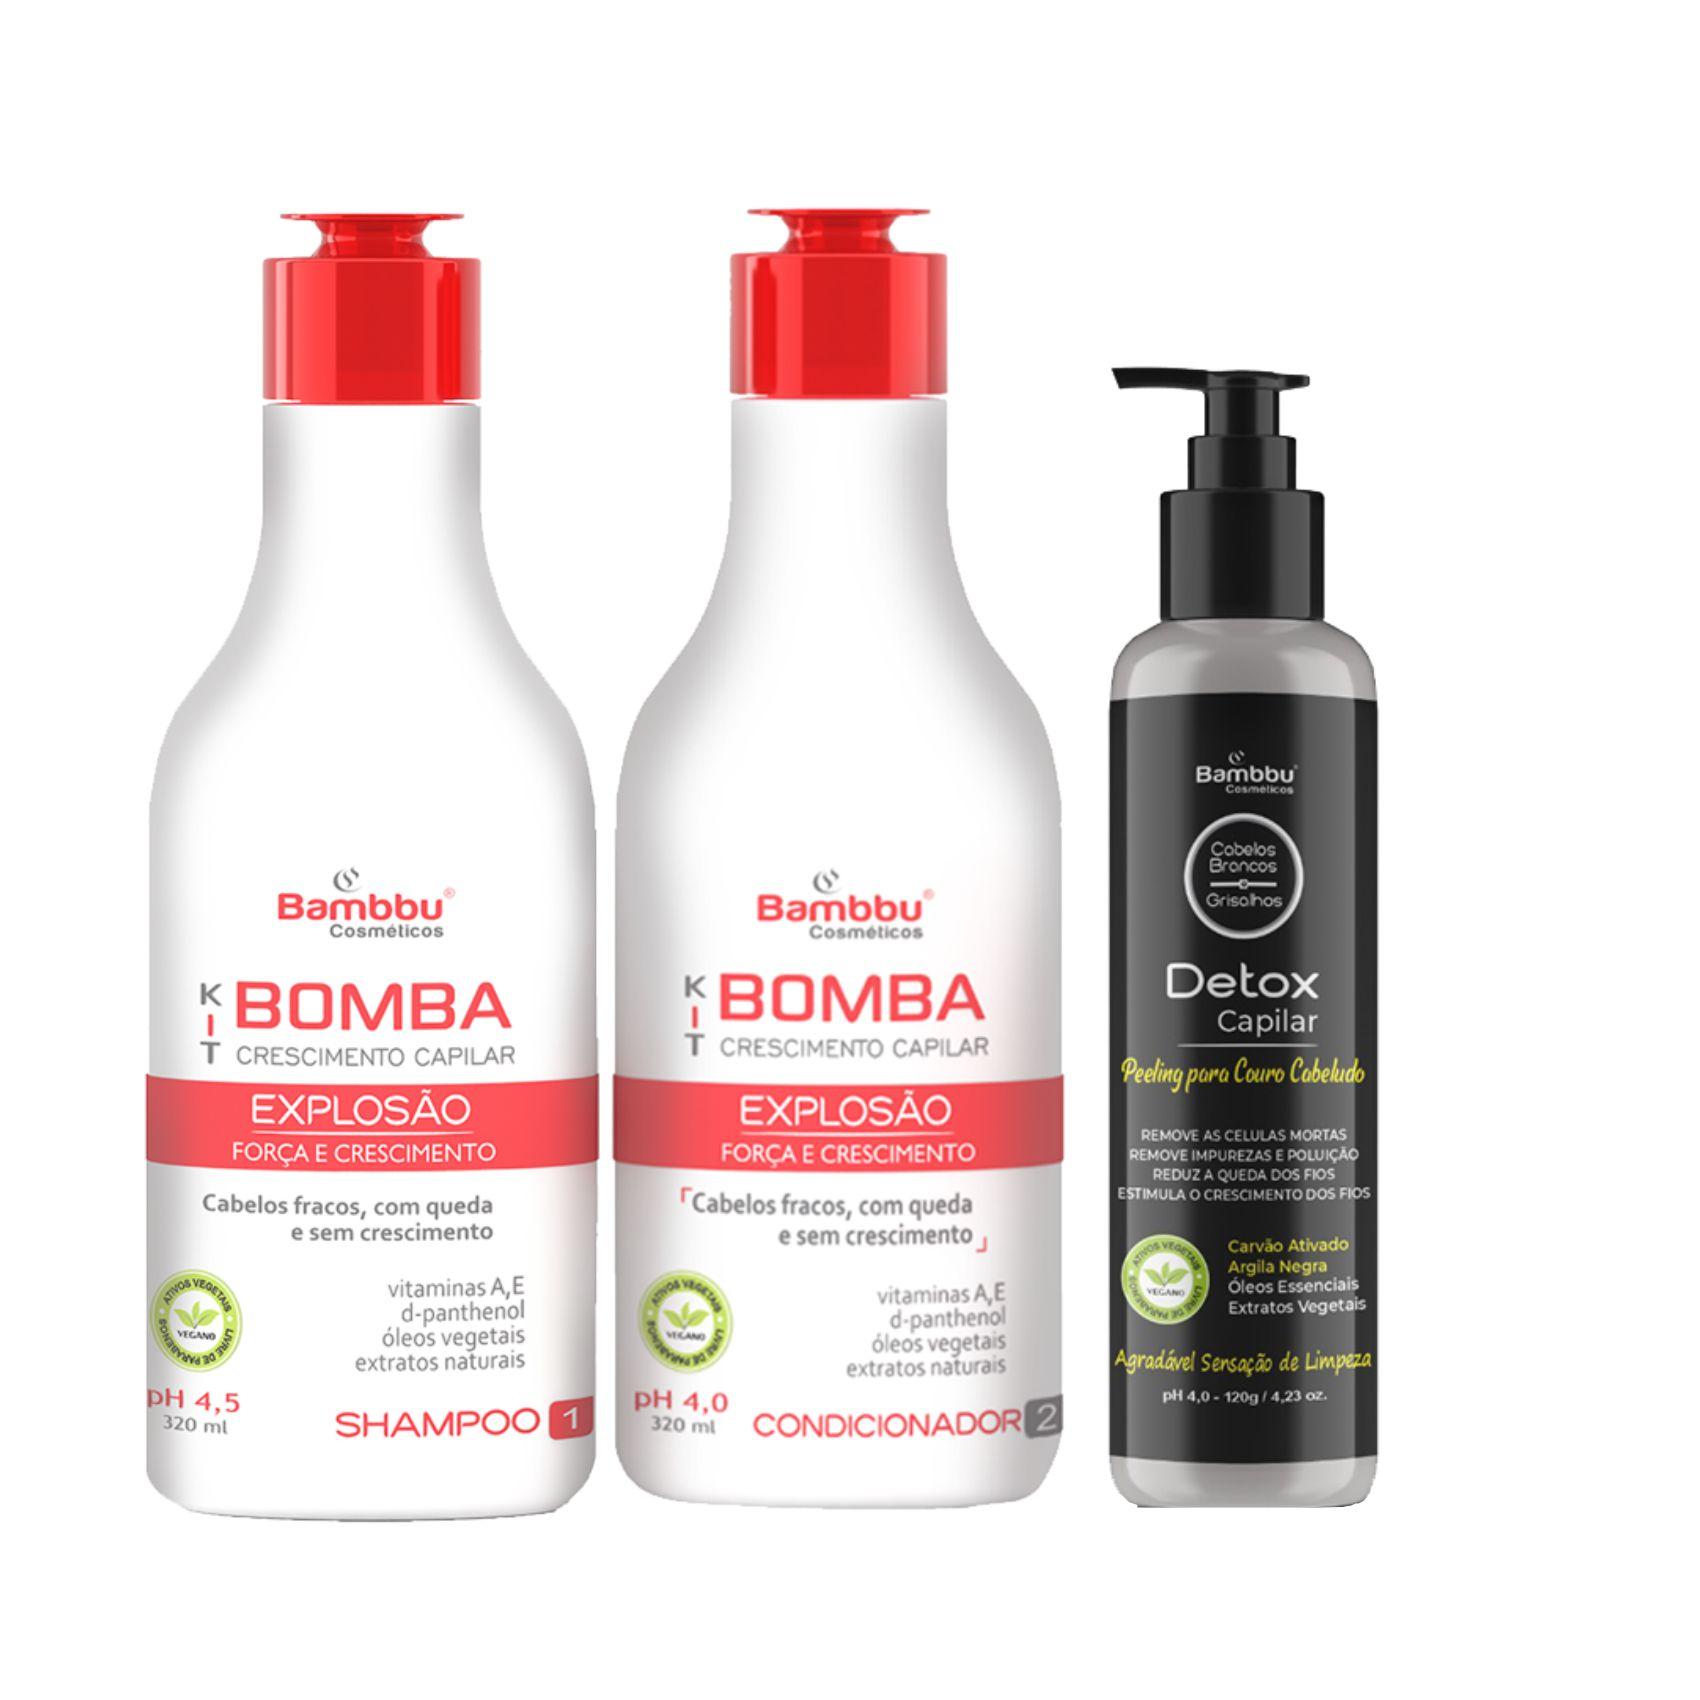 Kit Bomba Crescimento e Detox Capilar Couro Cabeludo (Kit Bomba 2 passos)